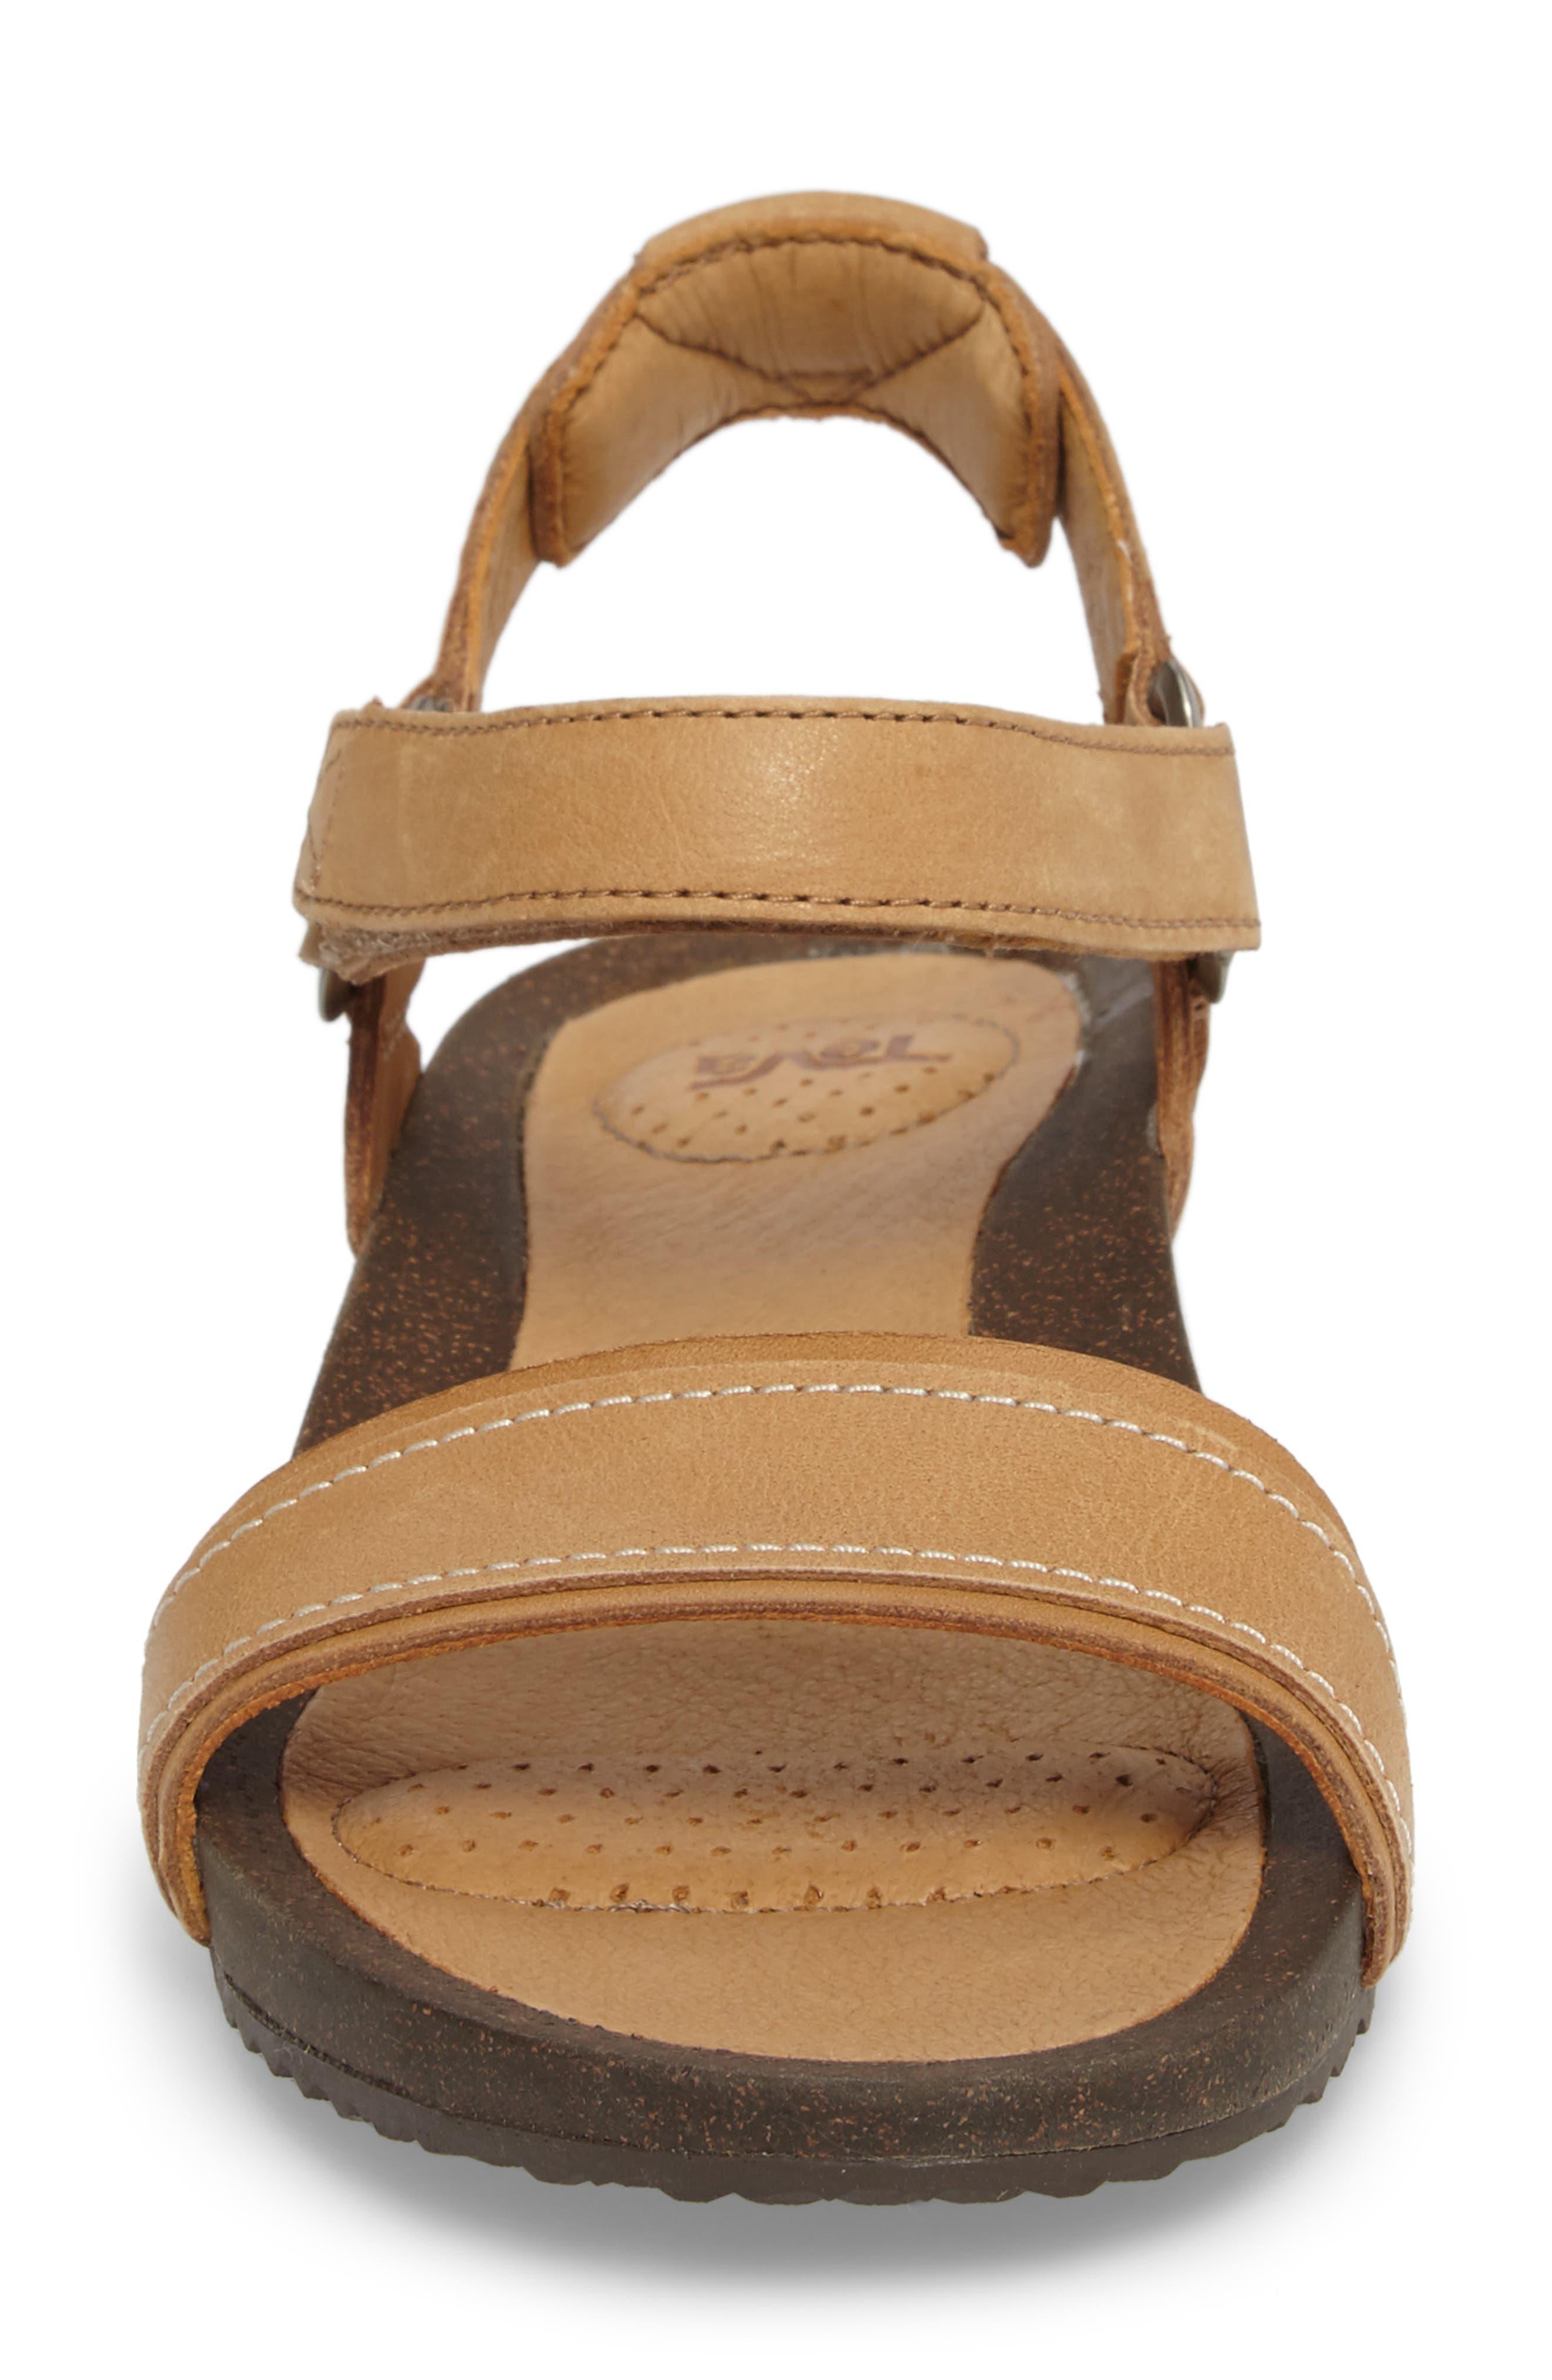 Ysidro Stitch Sandal,                             Alternate thumbnail 4, color,                             Tan Leather